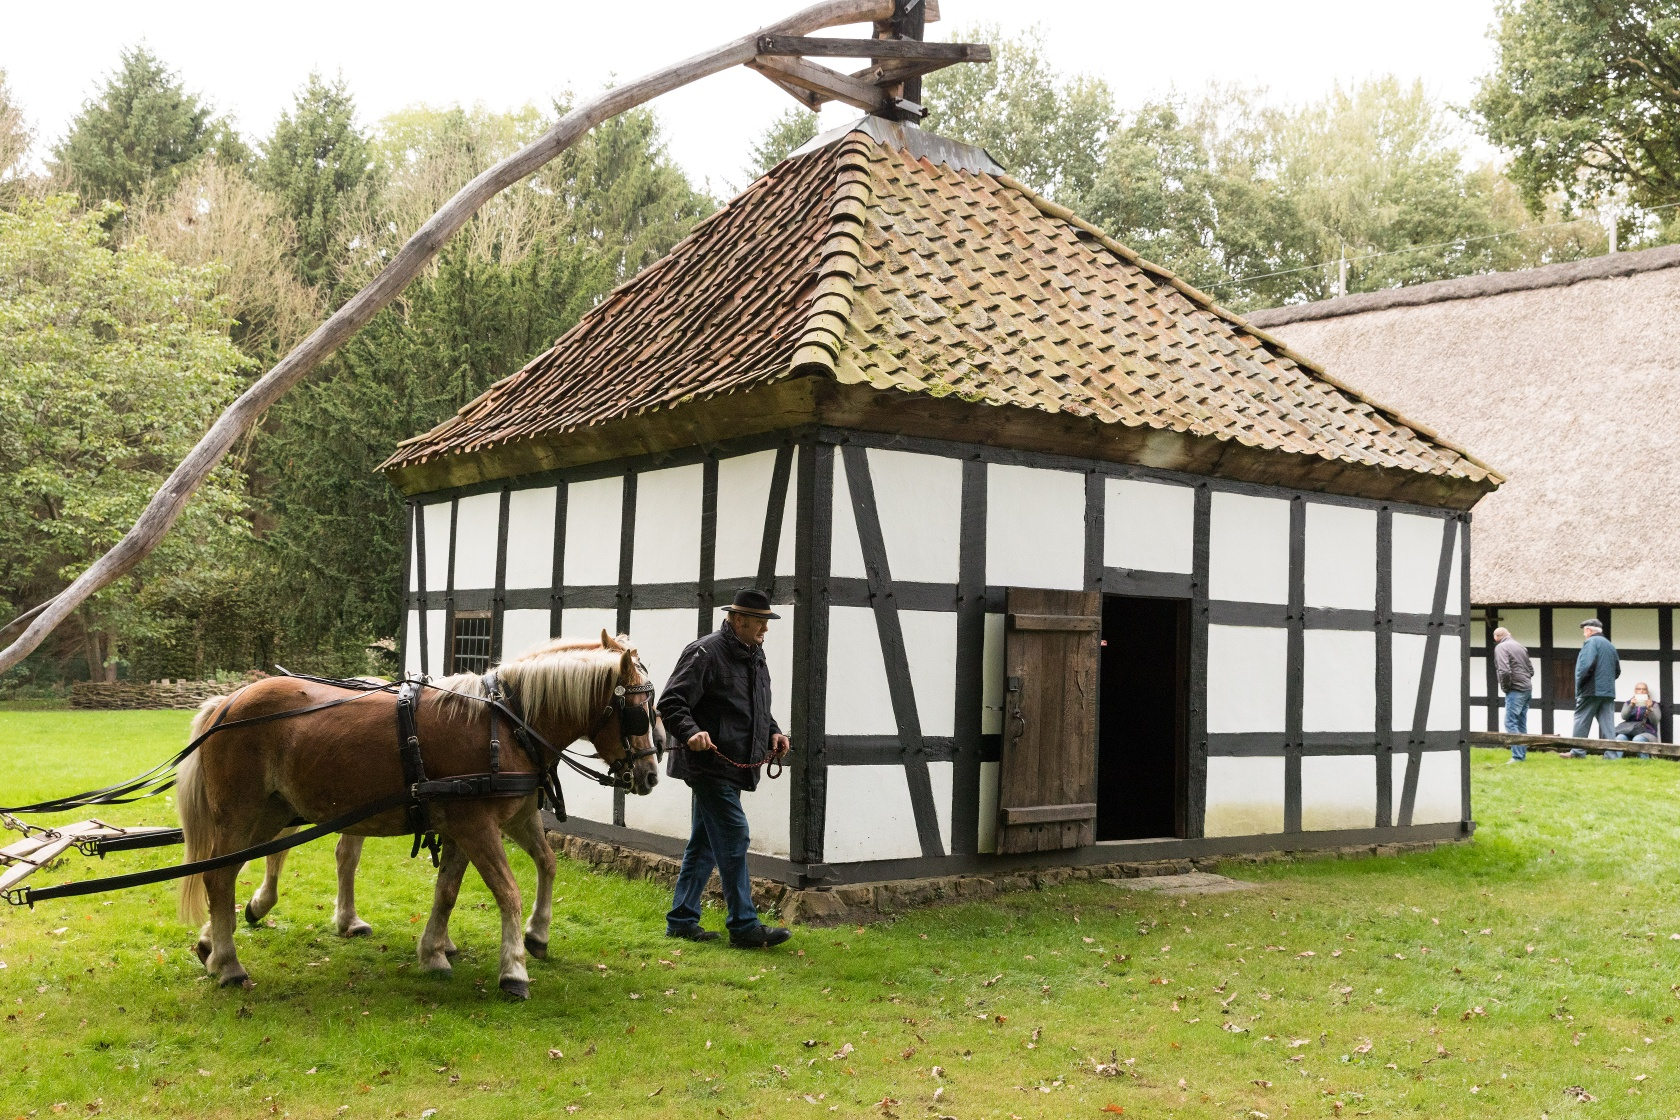 Rossmühle auf dem Museumshof in Betrieb